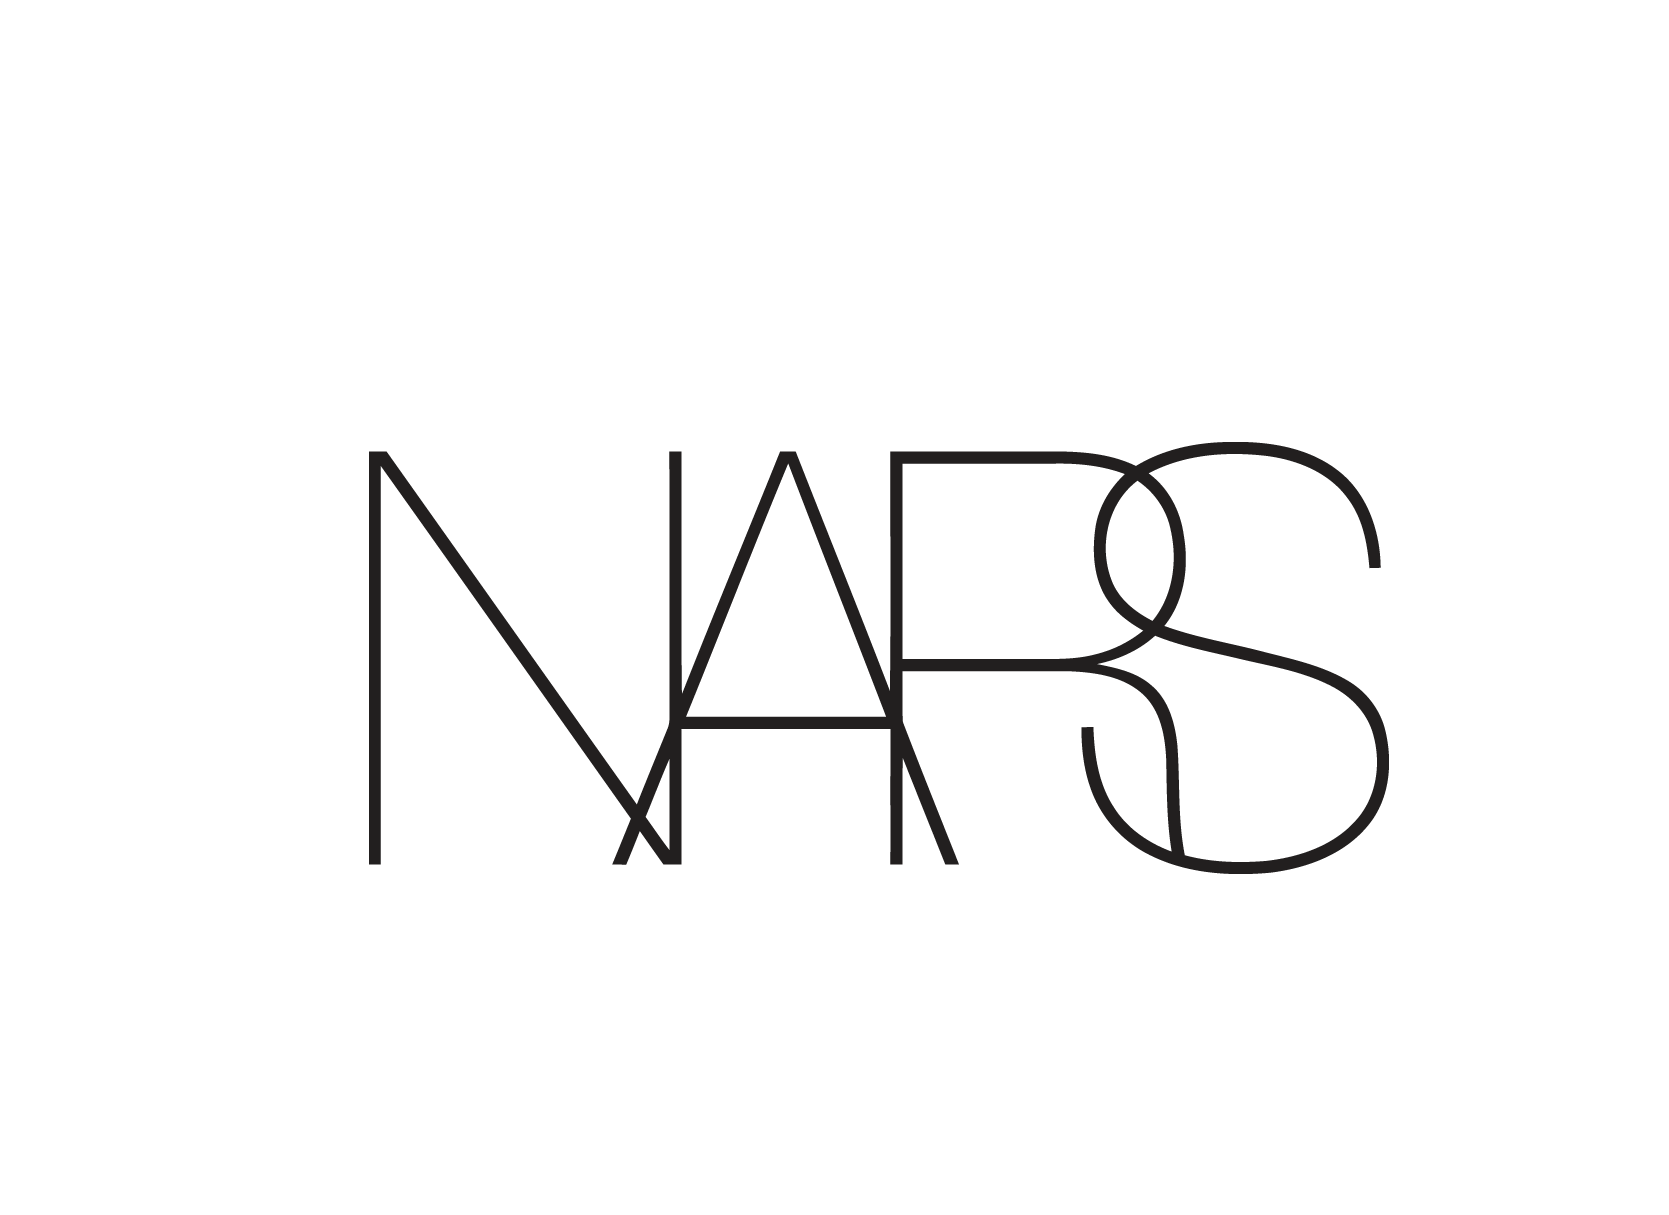 NARS, NARS Hot Nights Face Palette, NARS Hot Nights Face Palette รีวิว, NARS Hot Nights Face Palette ราคา, NARS Hot Nights Face Palette ของแท้, พาเลทท์ Nars